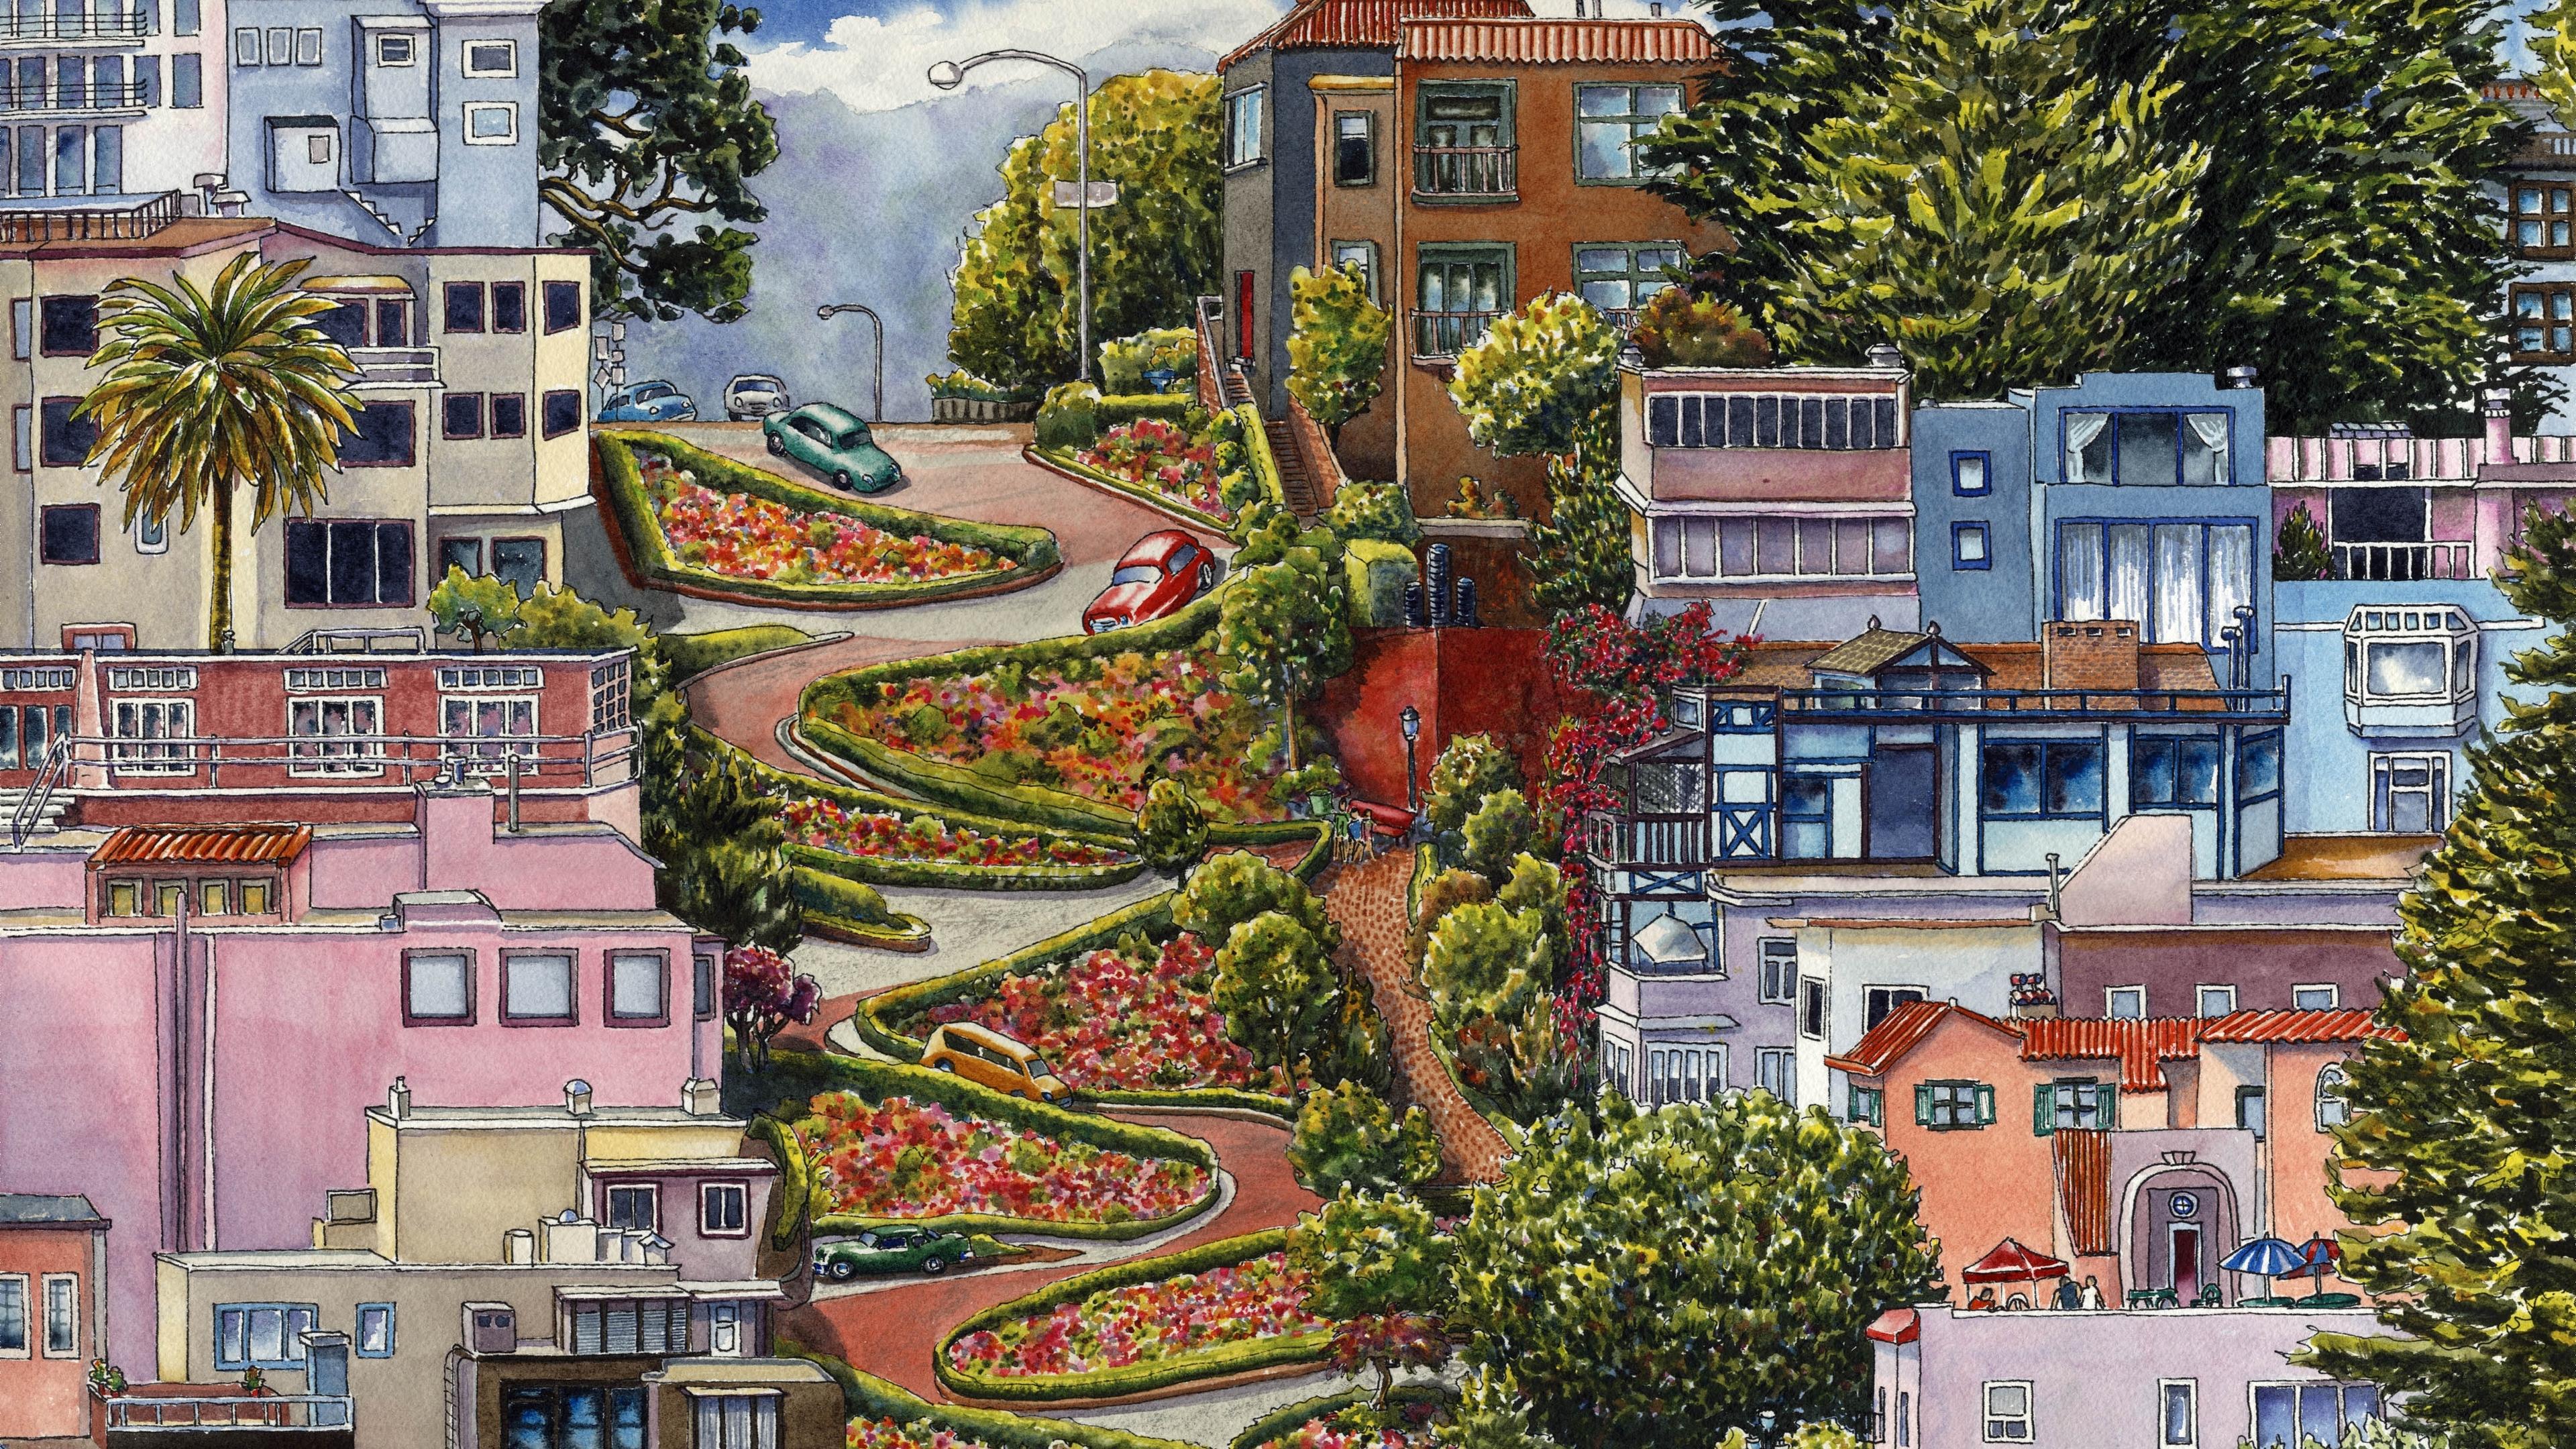 lombard street san francisco california art 4k 1538066349 - lombard street, san francisco, california, art 4k - san francisco, lombard street, California